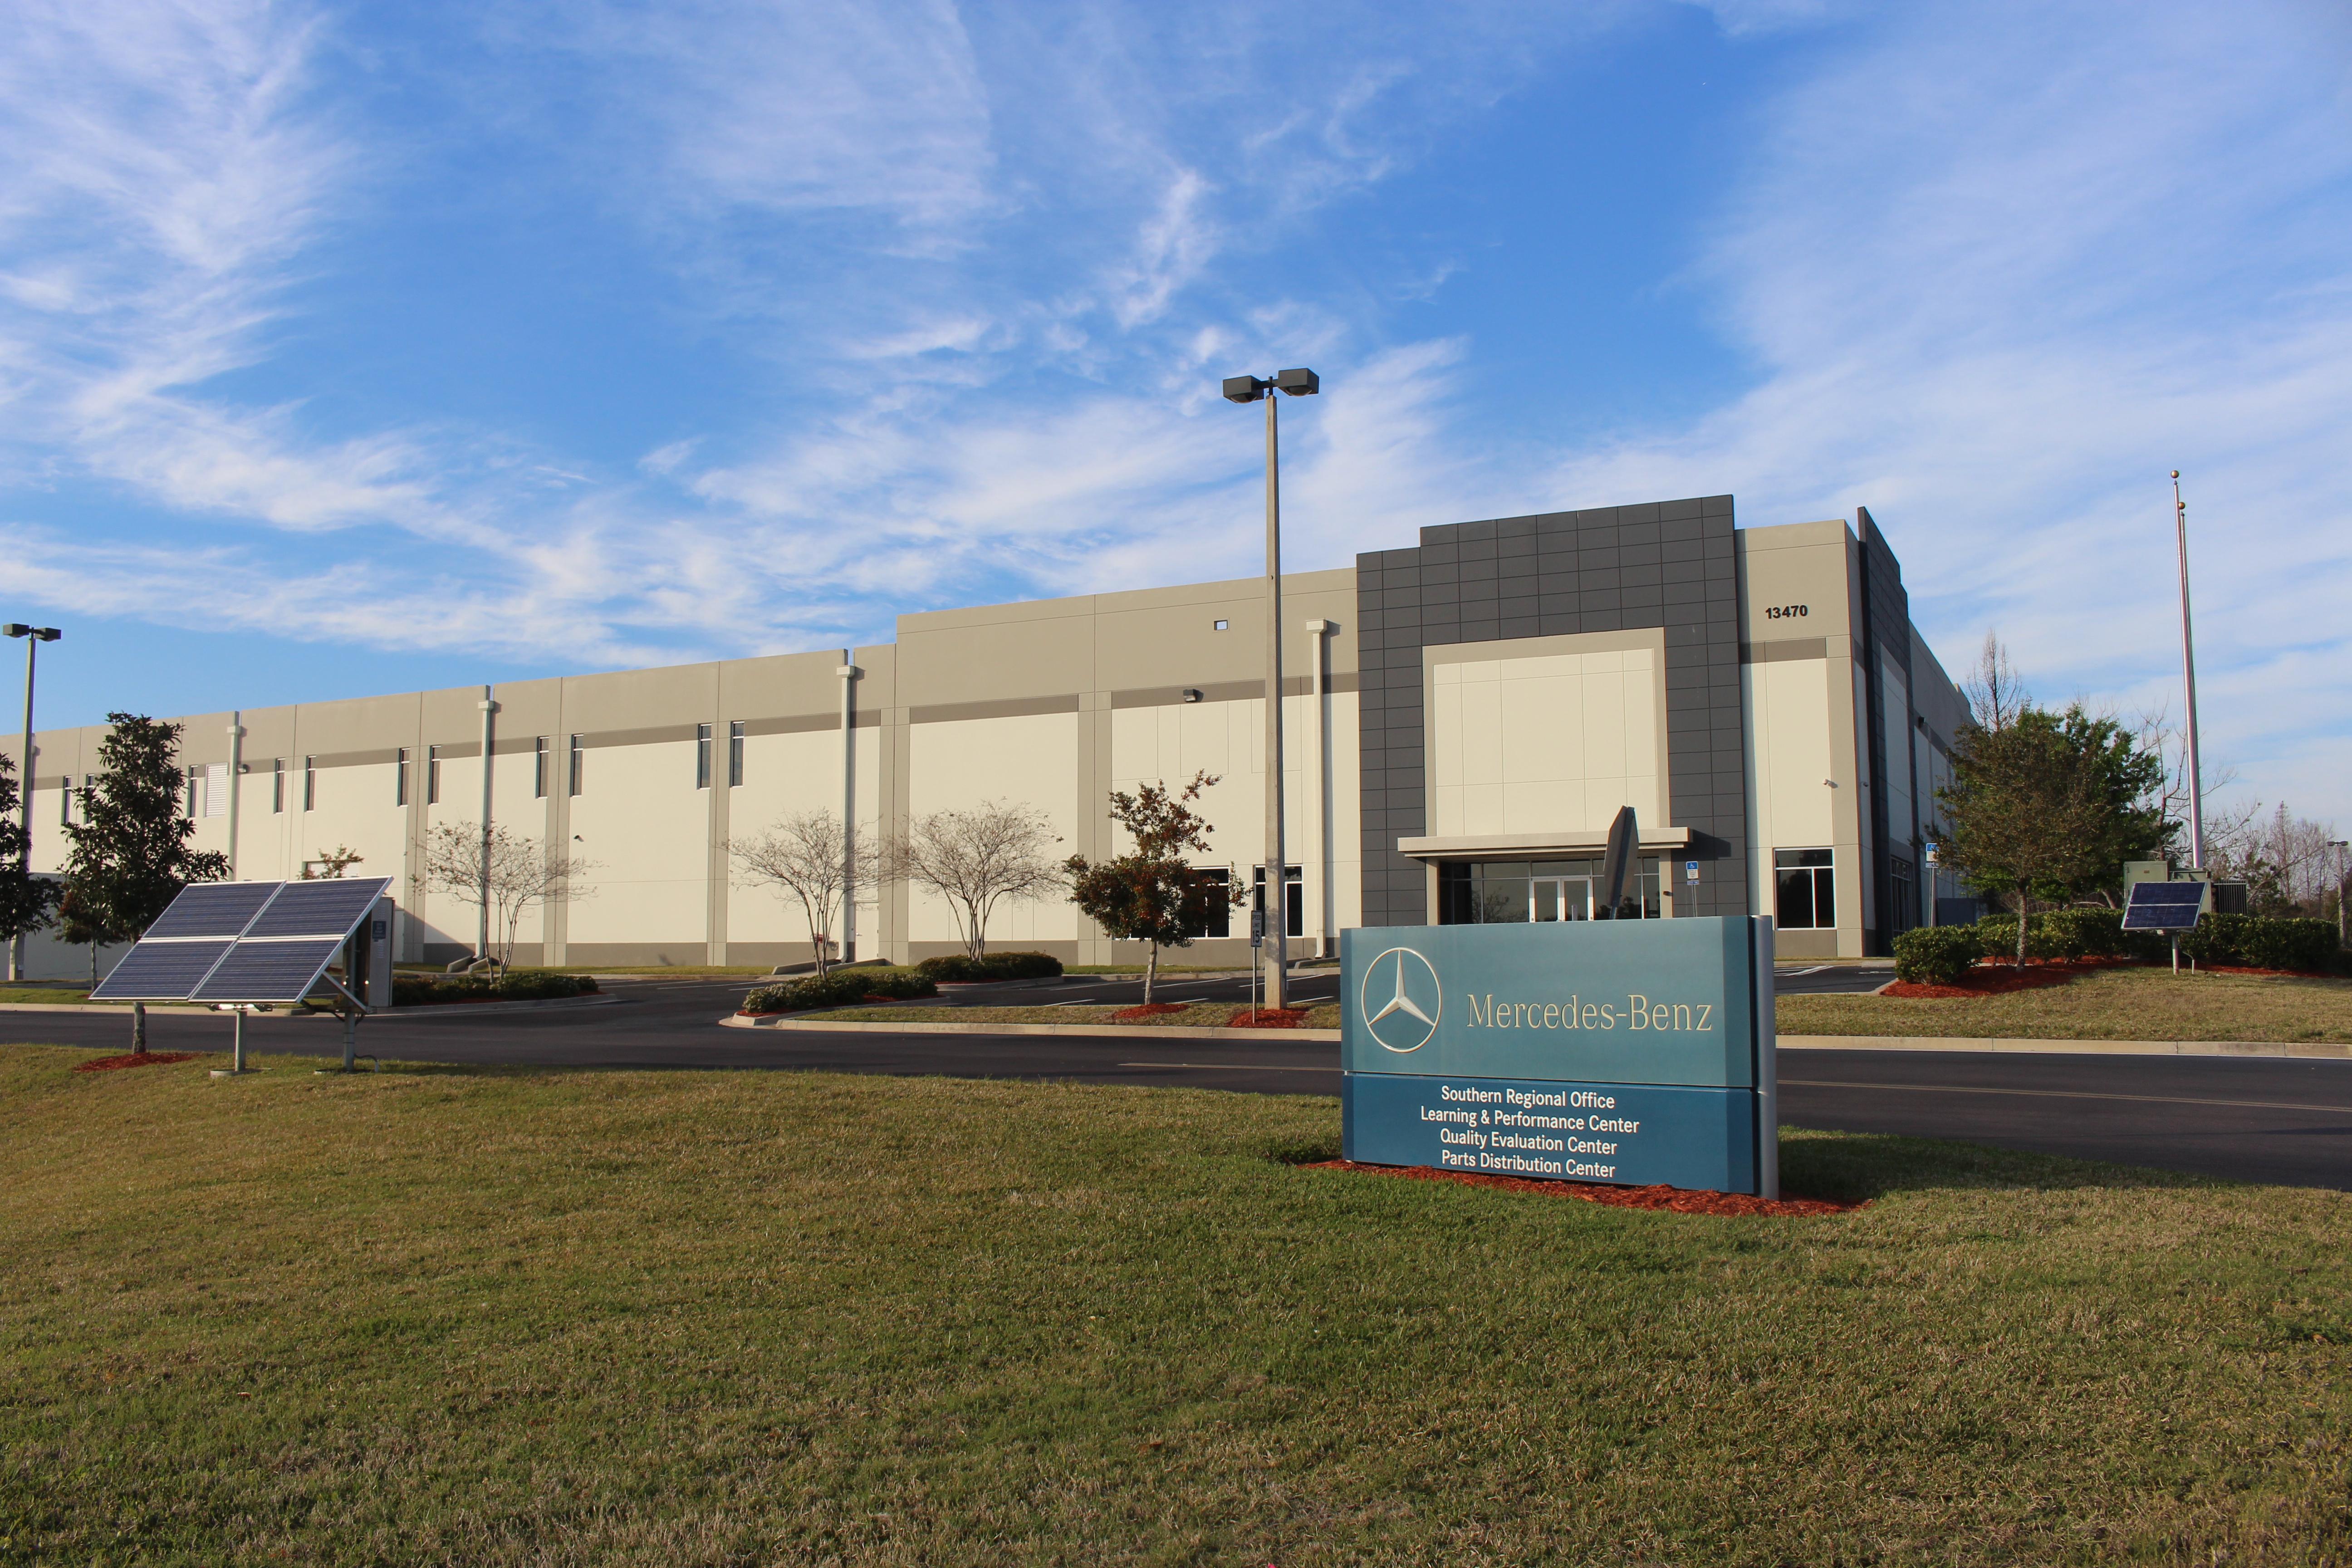 File:Mercedes Benz Southern Regional Office, Jacksonville International  Tradeport